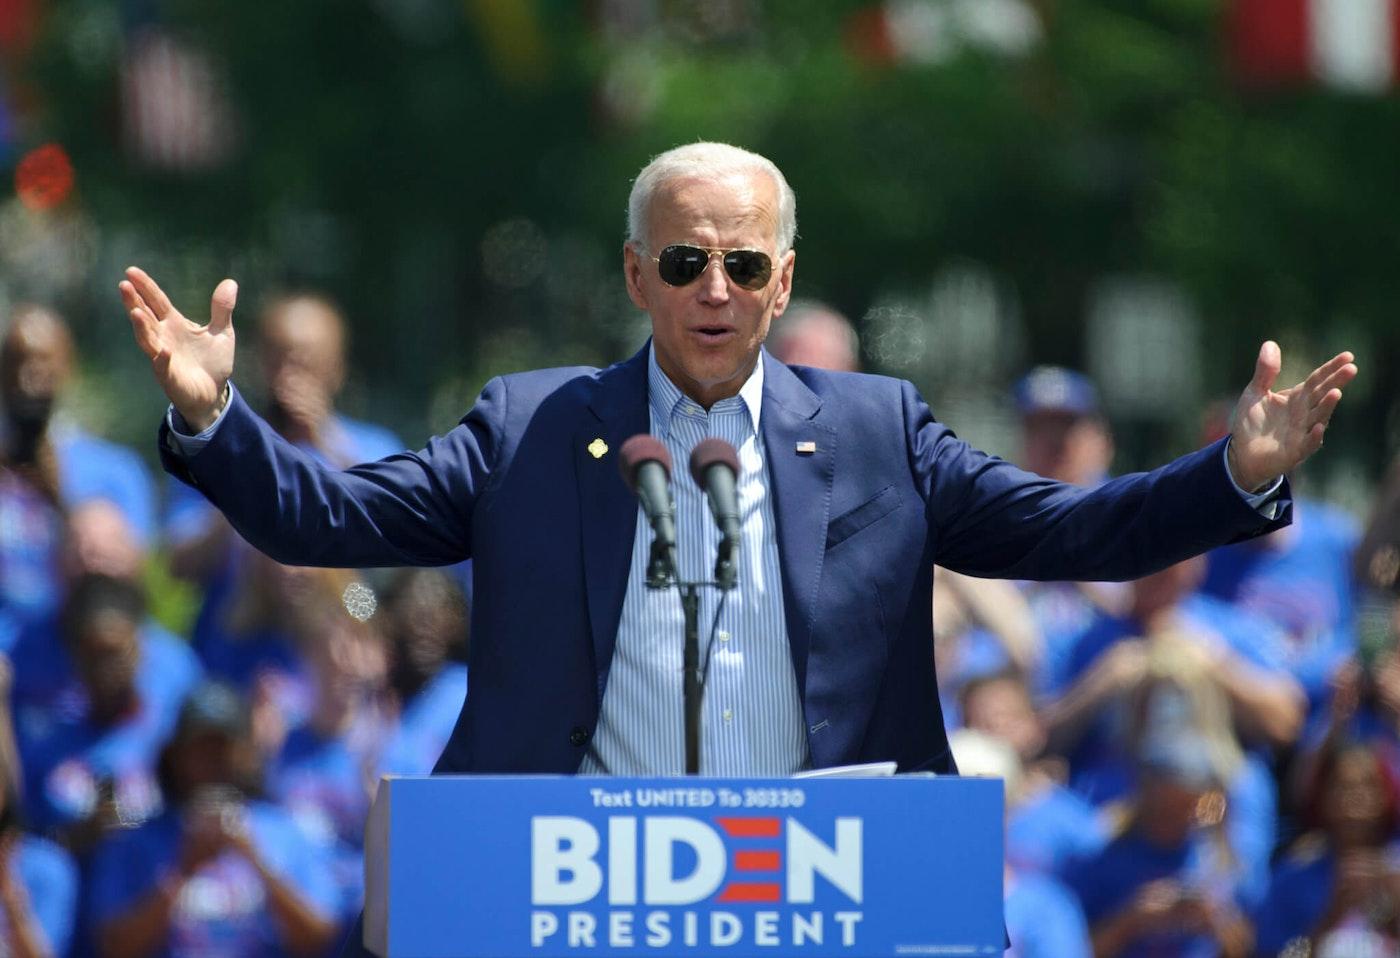 Joe Biden's lead keeps growing in Virginia, according to the latest polling numbers.